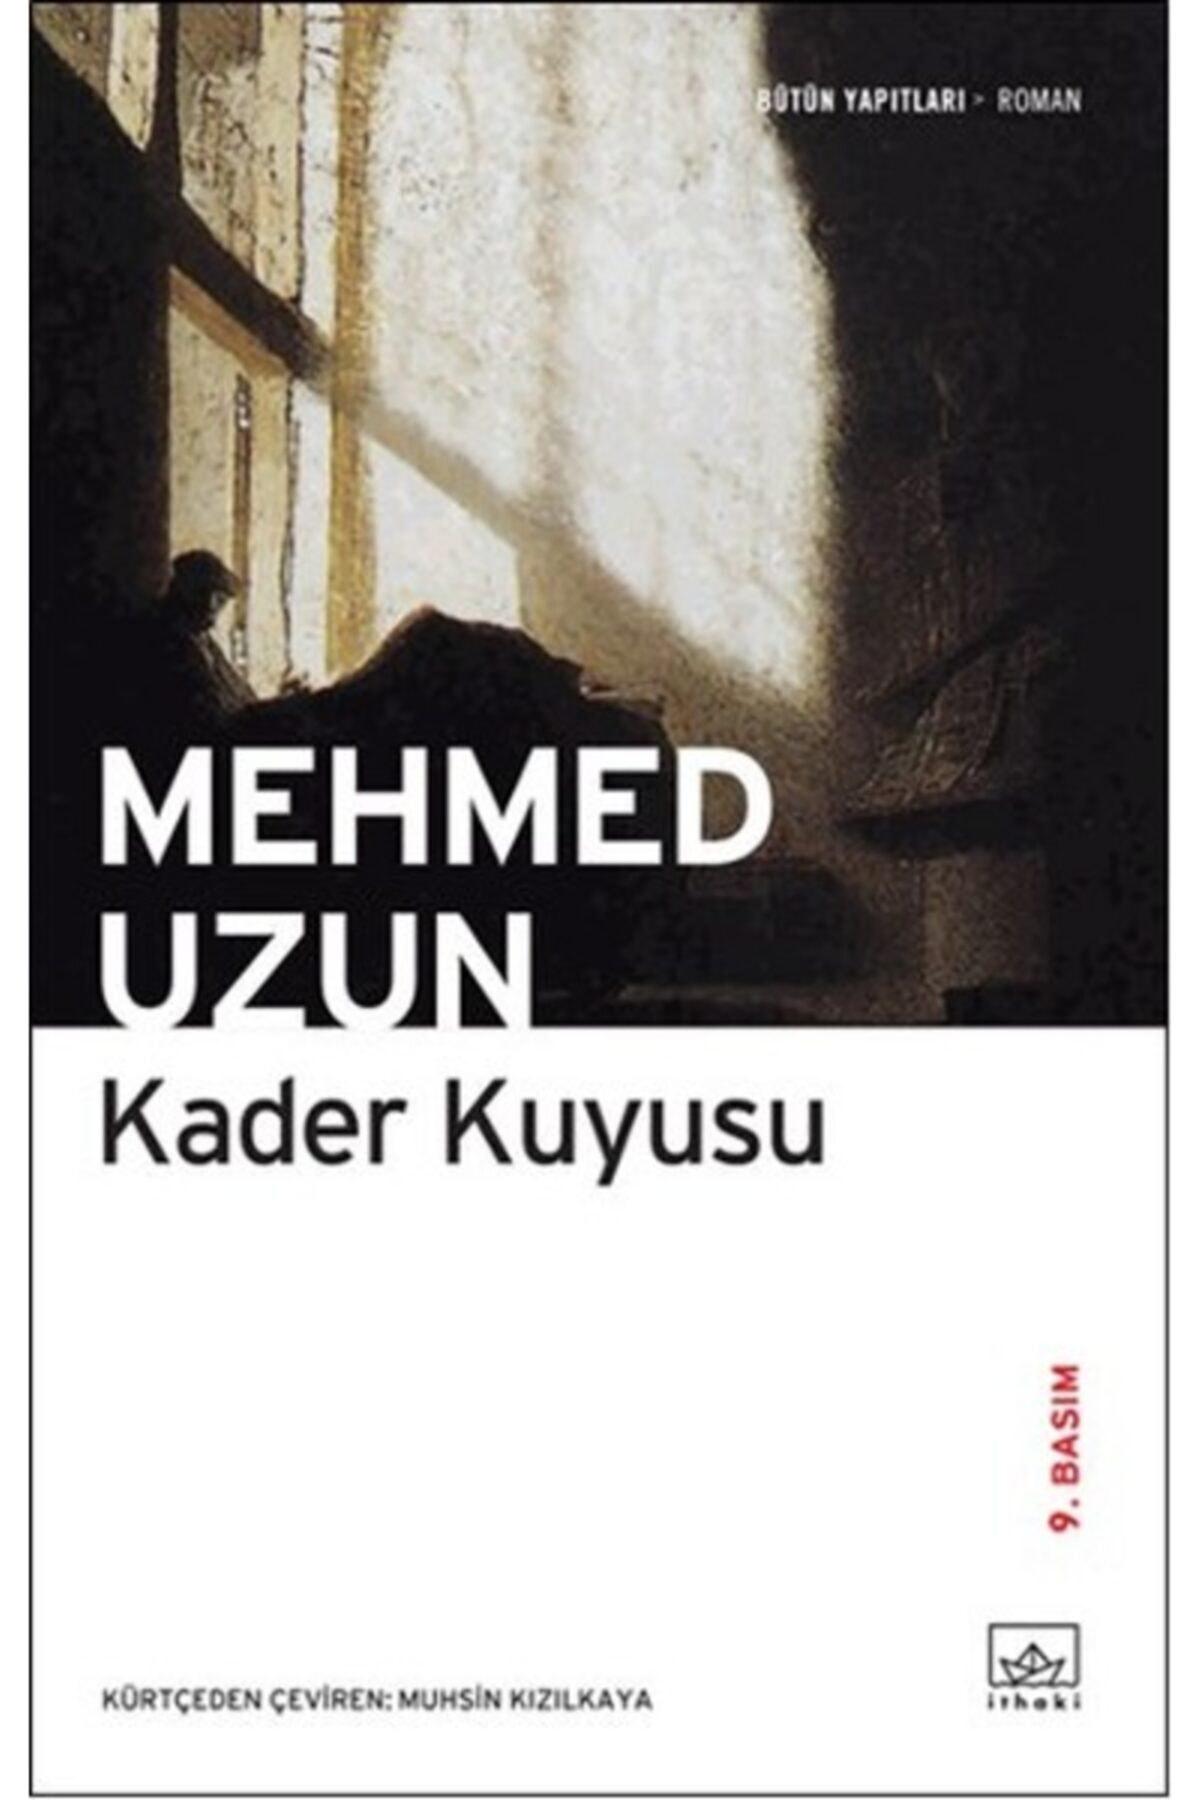 Muallim Neşriyat Kader Kuyusu Mehmed Uzun 1